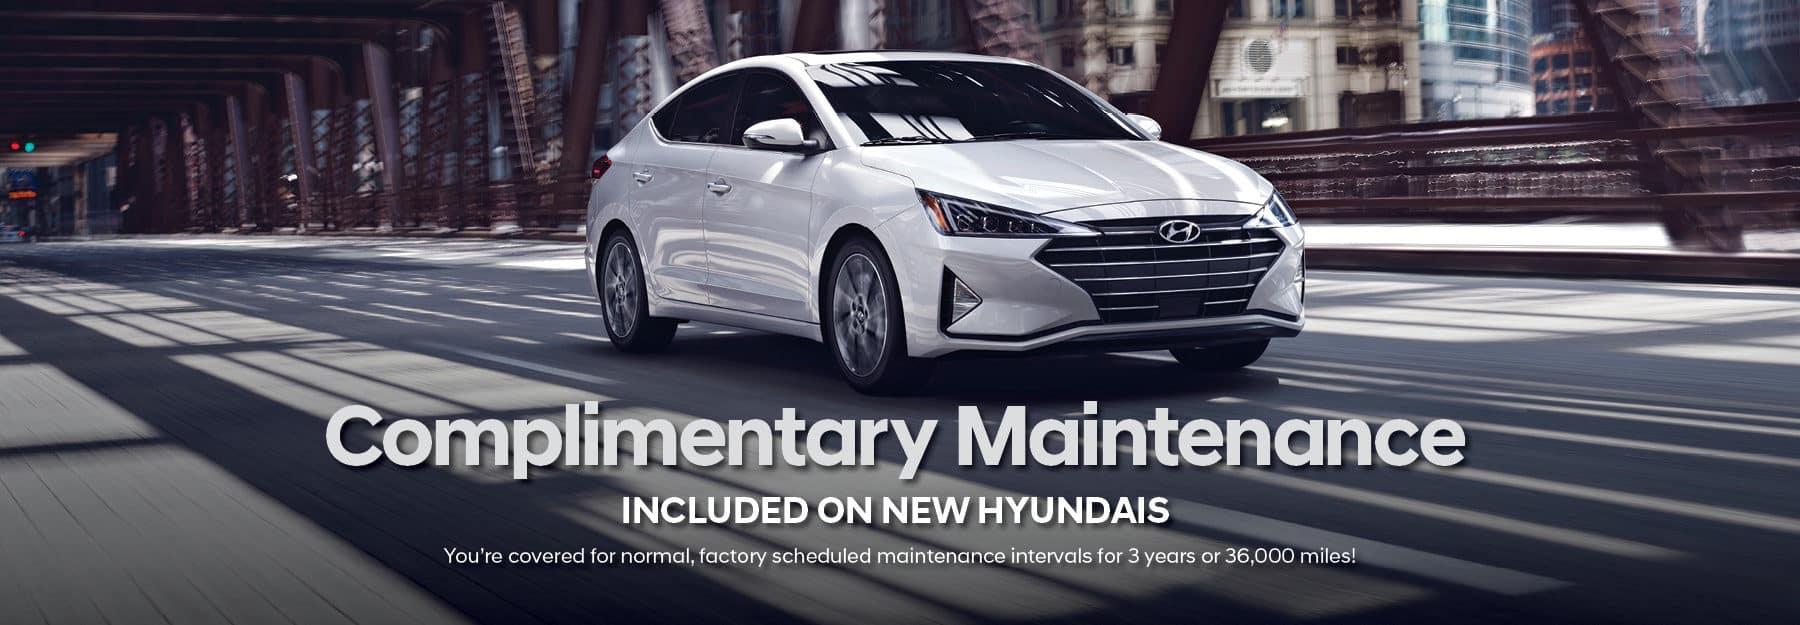 Complimentary Maintenance Included on New Hyundais